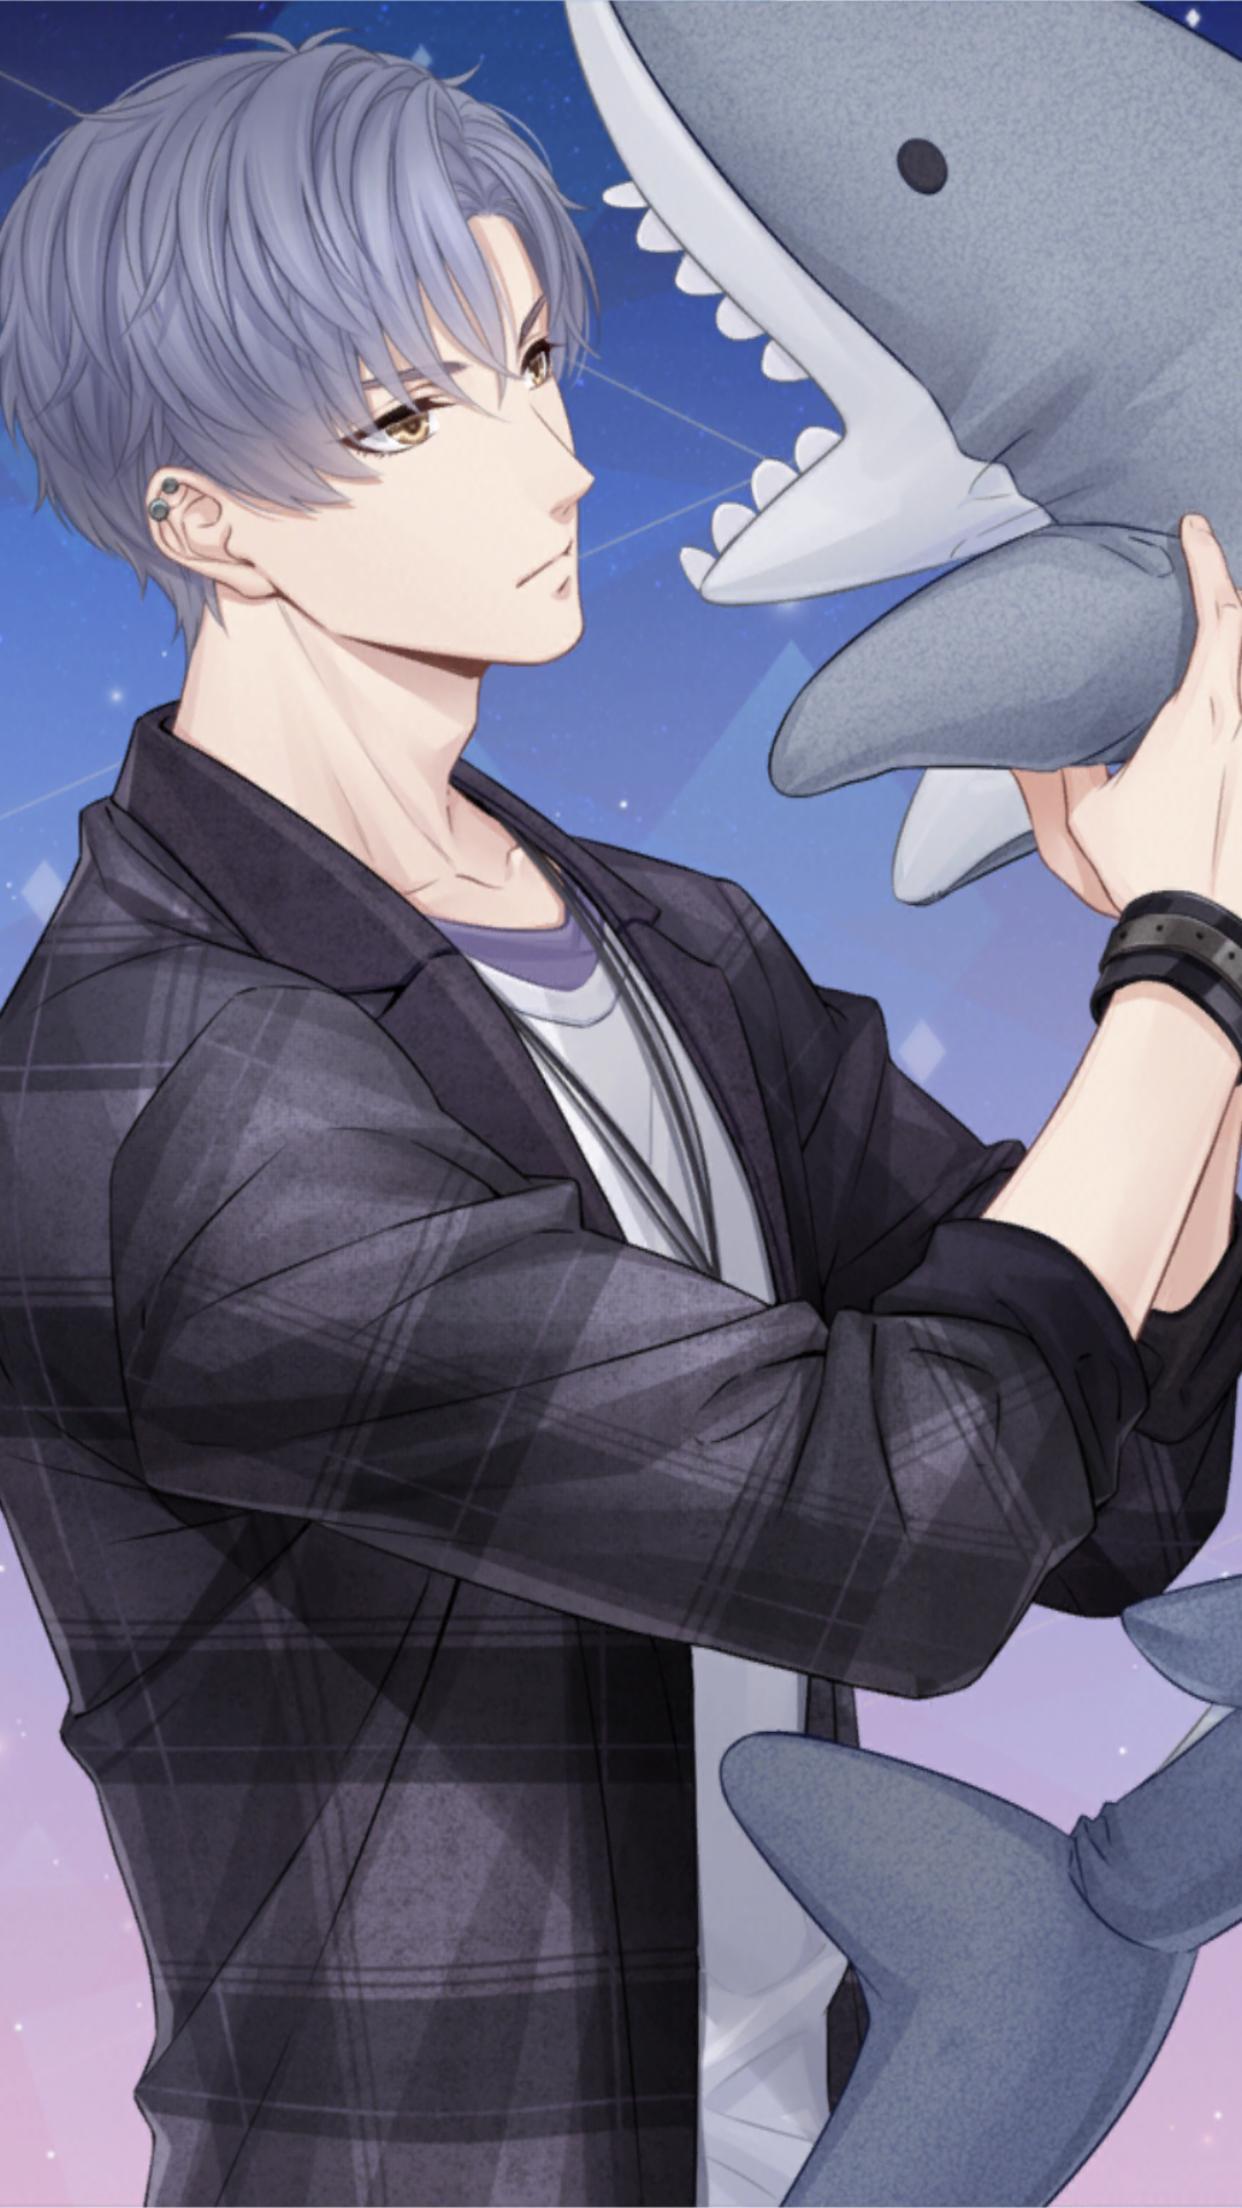 20凌肖生日R卡 in 2020 Romantic anime, Cool anime guys, Anime guys